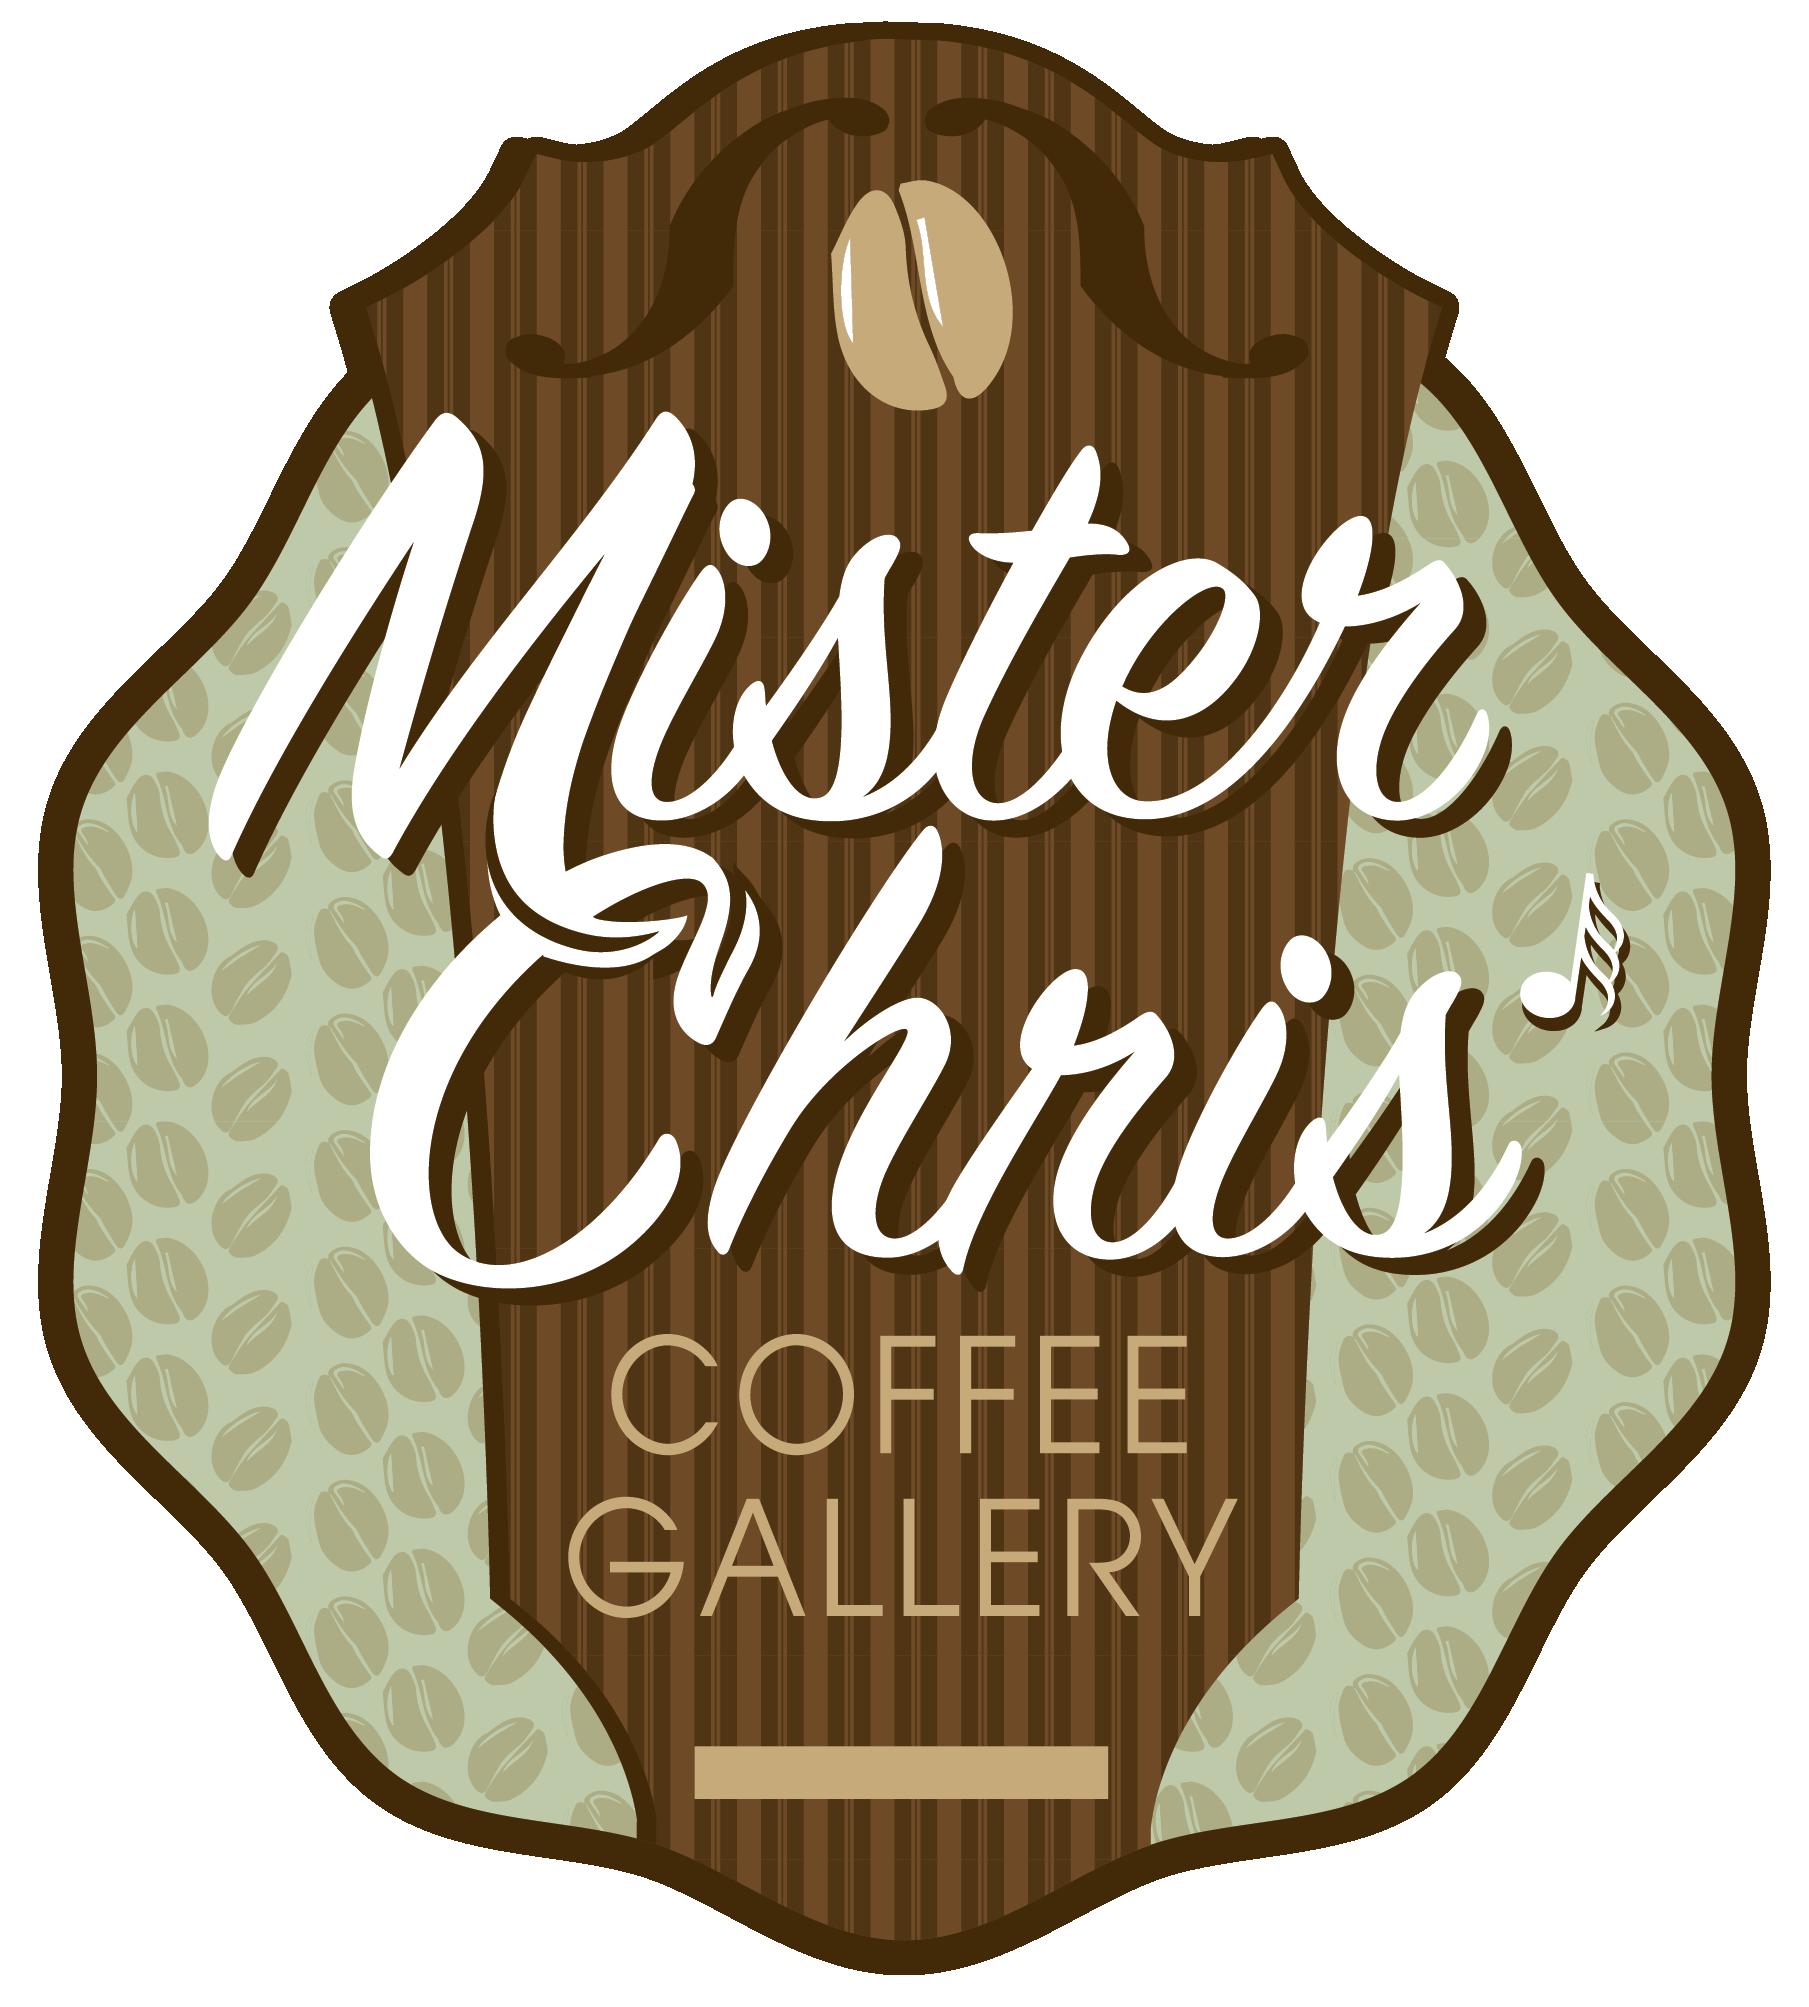 Mister Chris' Coffee Gallery